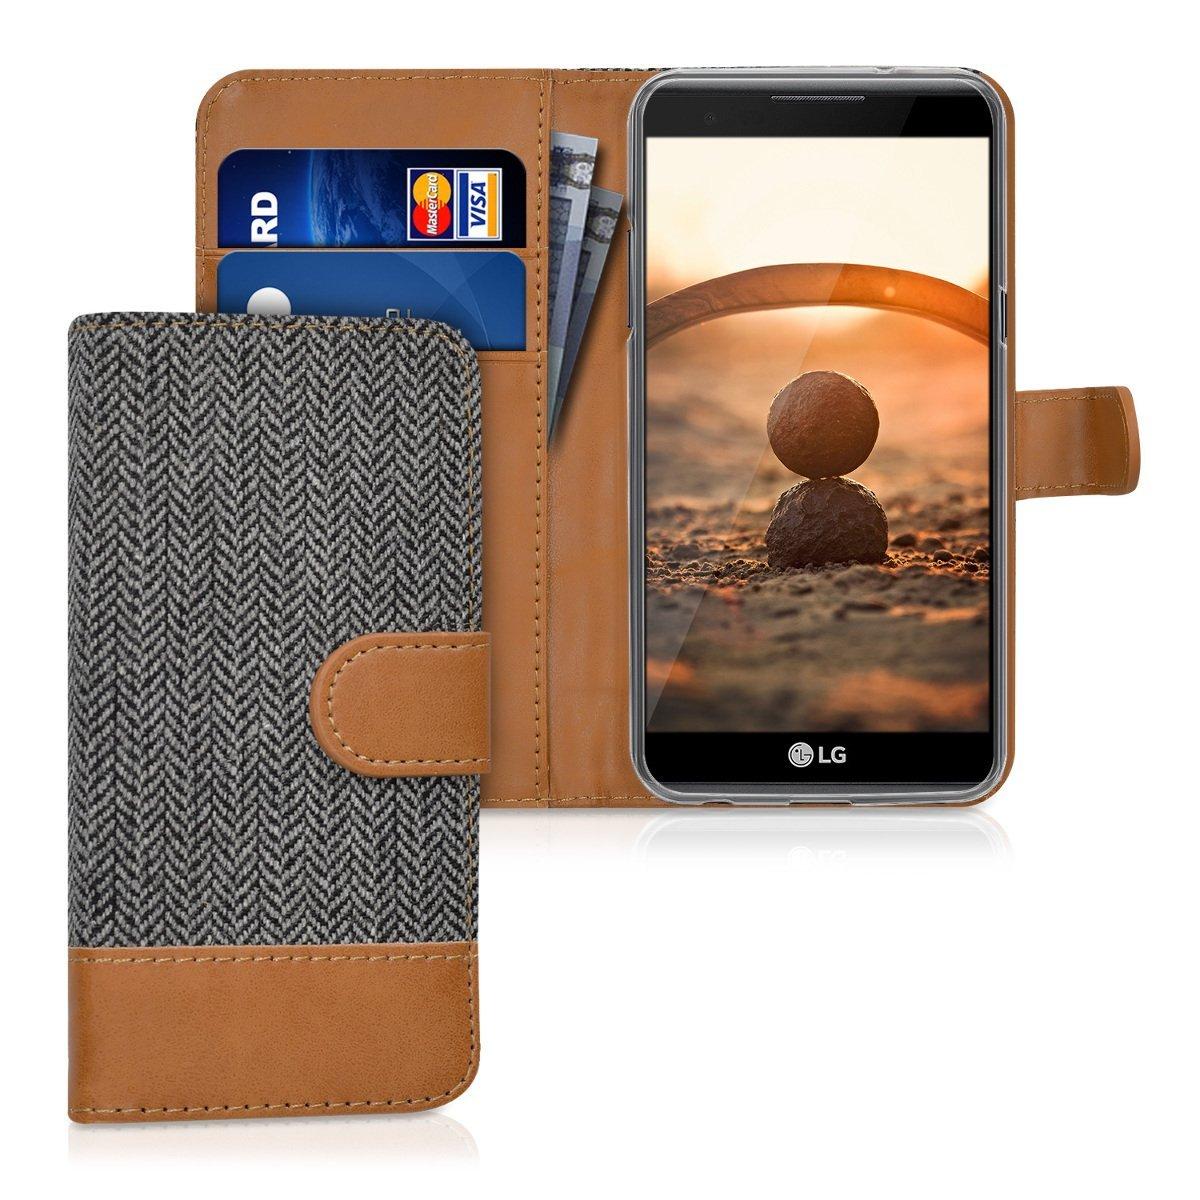 KW Θήκη - Πορτοφόλι LG X Power - Anthracite/ Brown (39815.02)